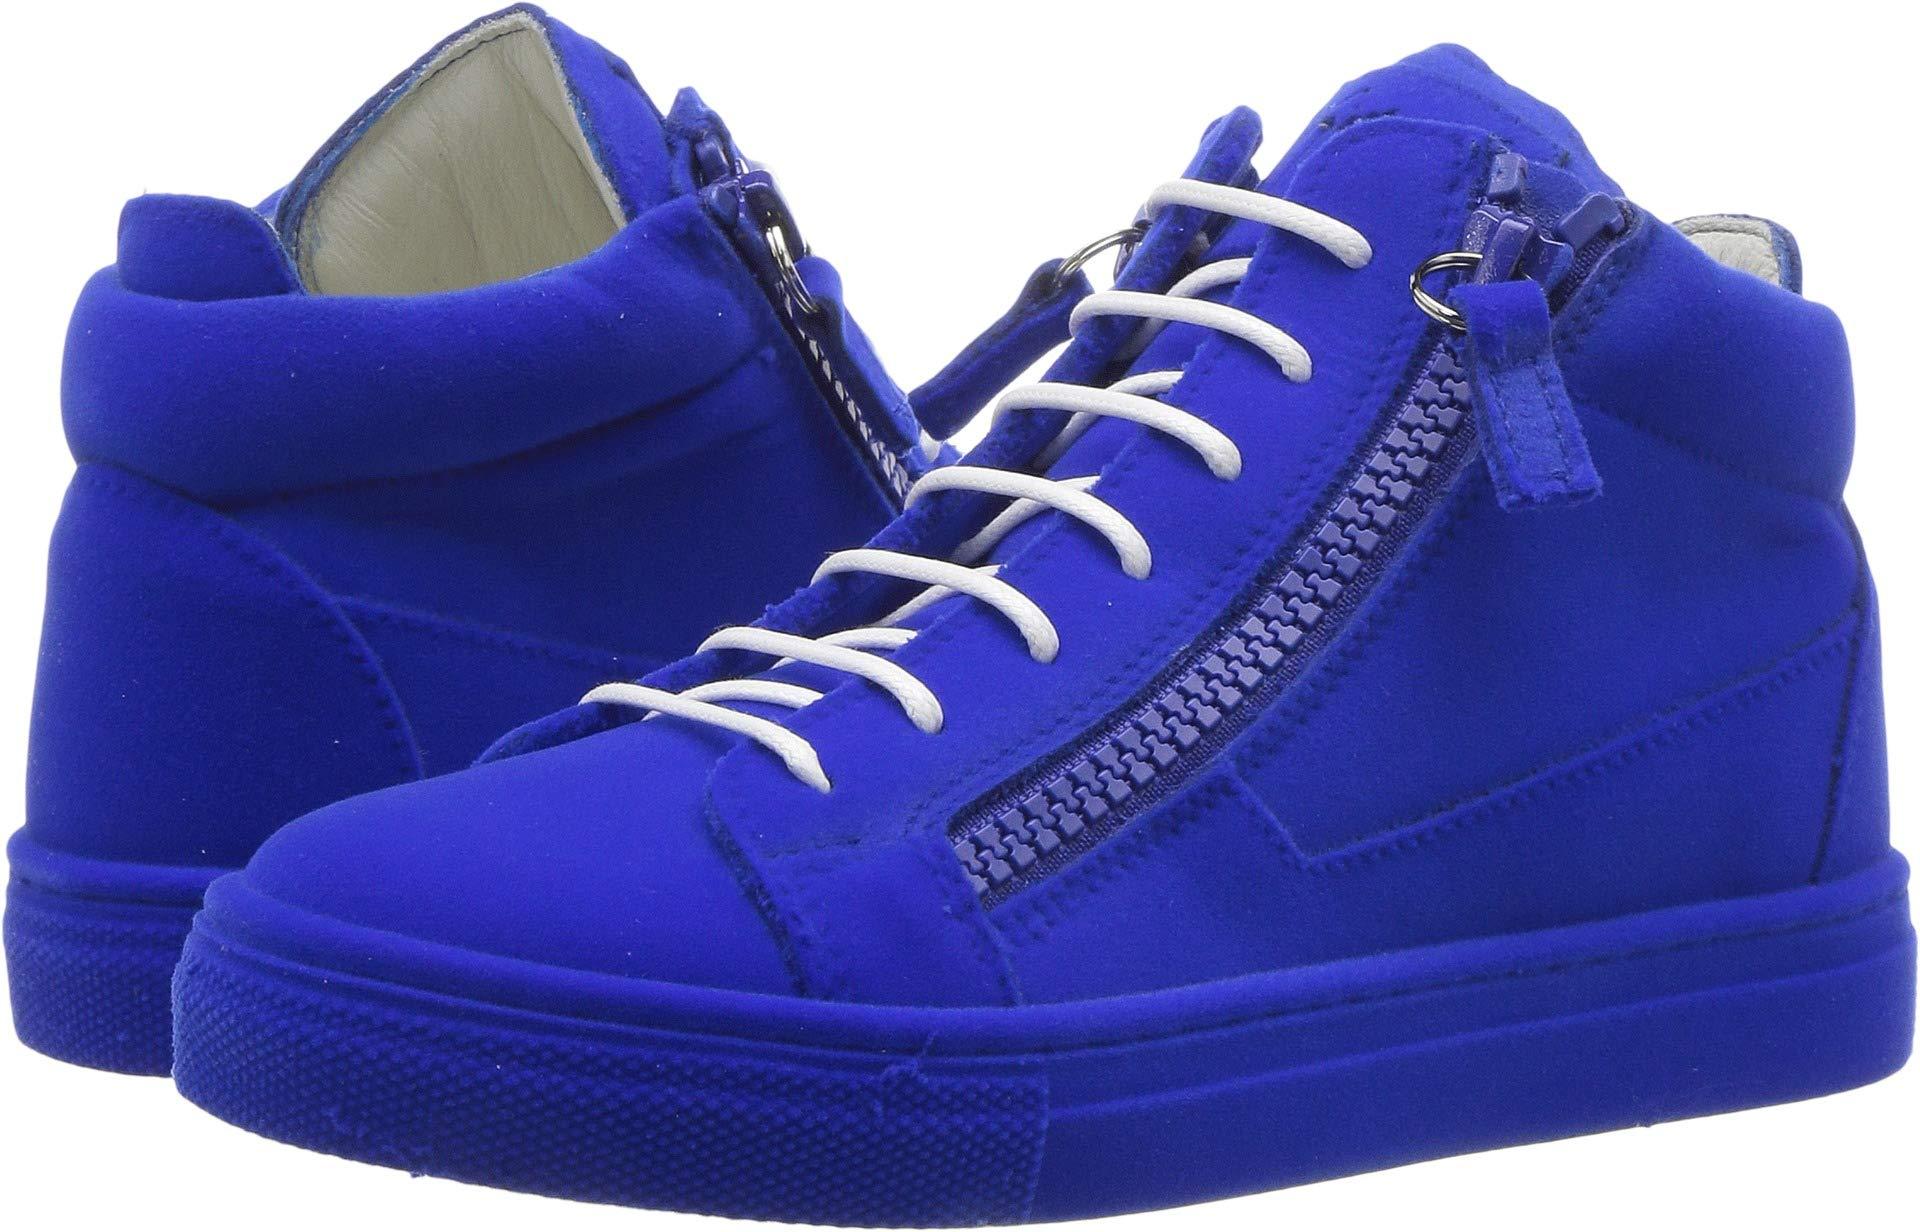 Giuseppe Zanotti Kids Unisex Flock Sneaker (Toddler/Little Kid) Electric Blue 30 M EU M